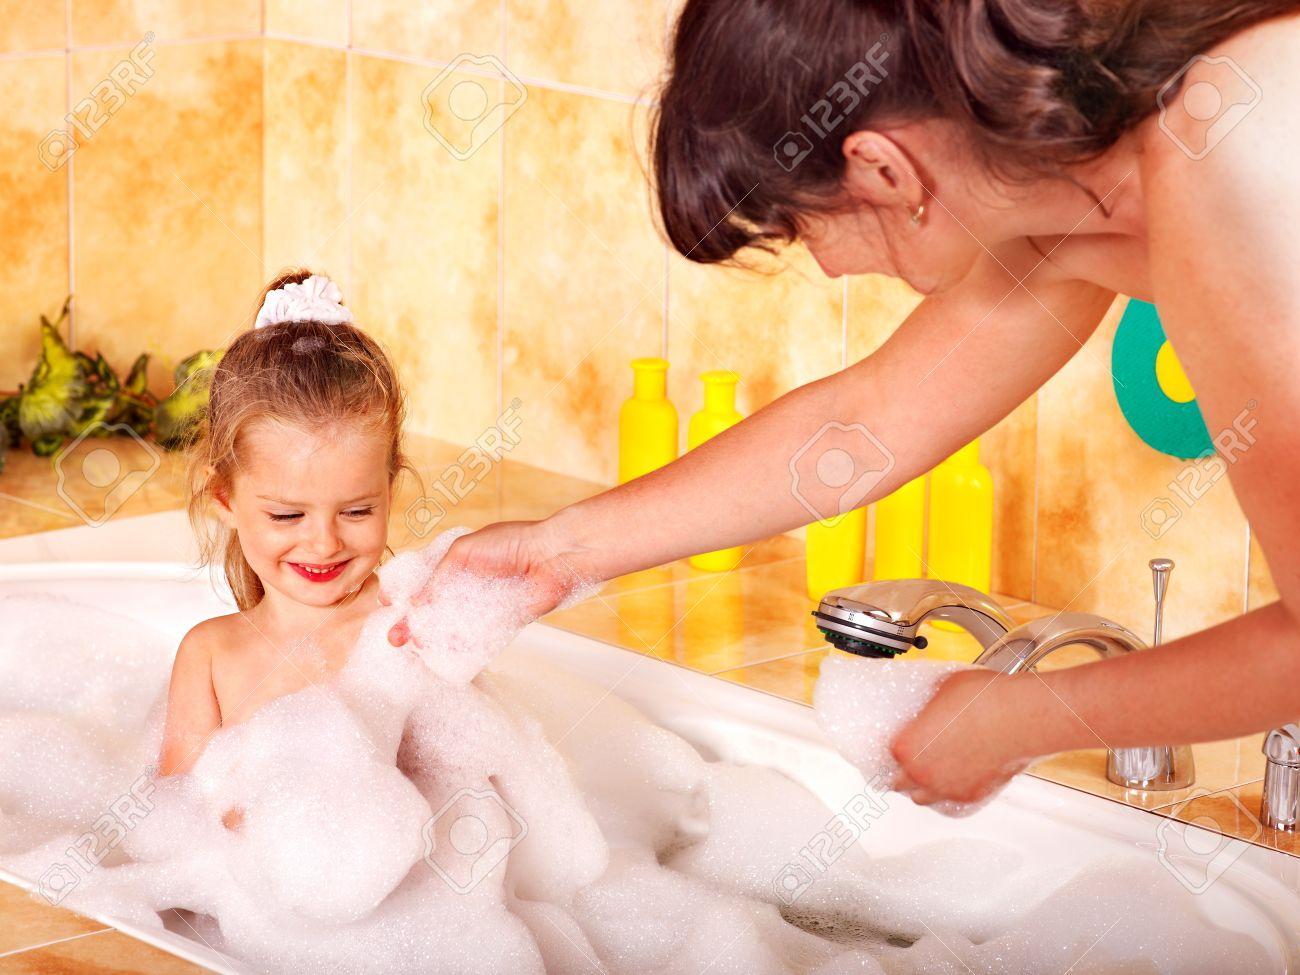 Фото в бане с мамой 19 фотография